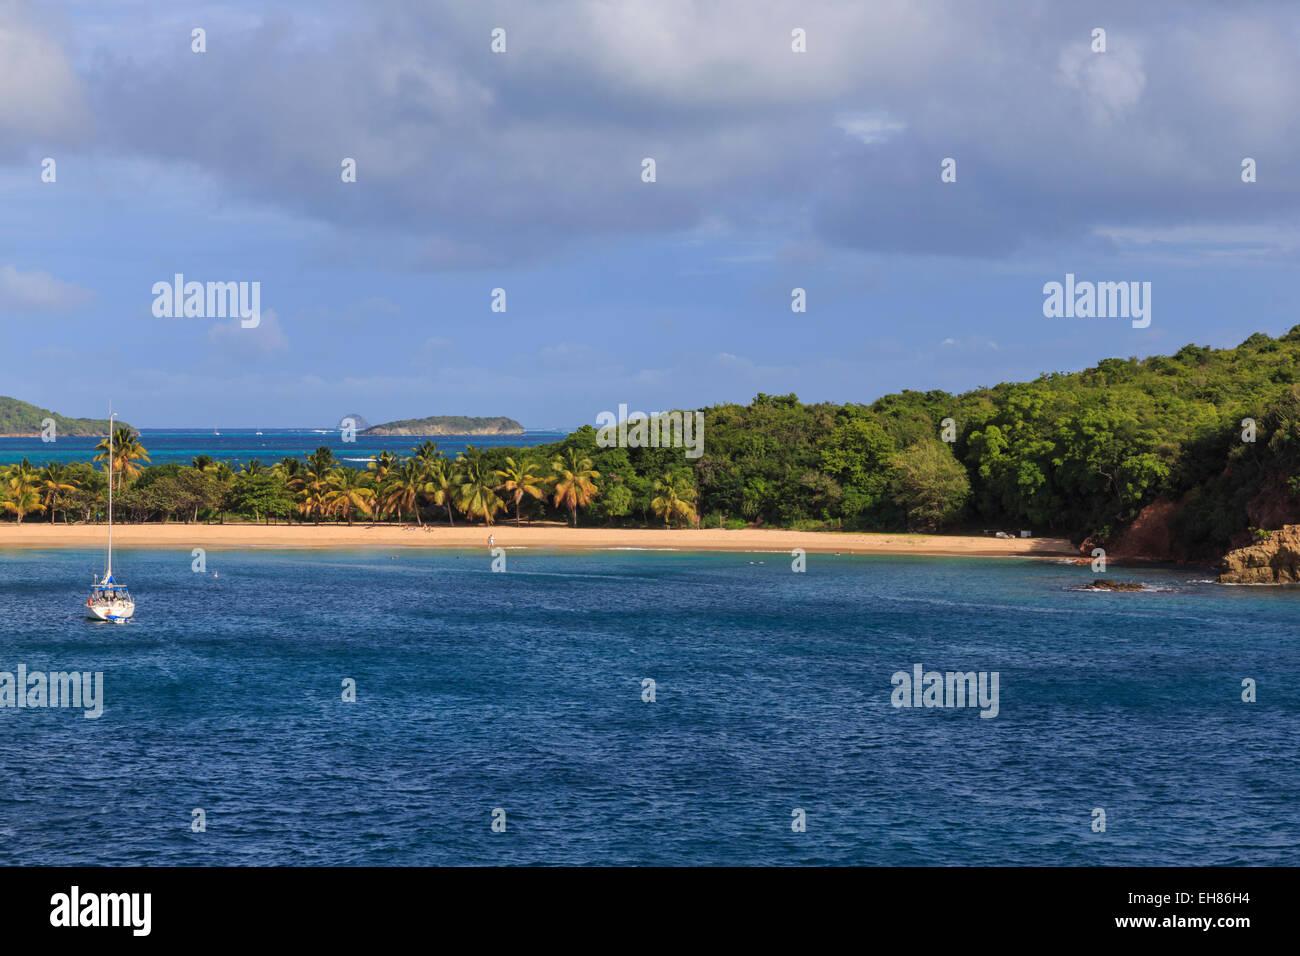 Saline Bay to windward side and Tobago Cays, Mayreau, Grenadines of St. Vincent, Windward Islands, West Indies - Stock Image